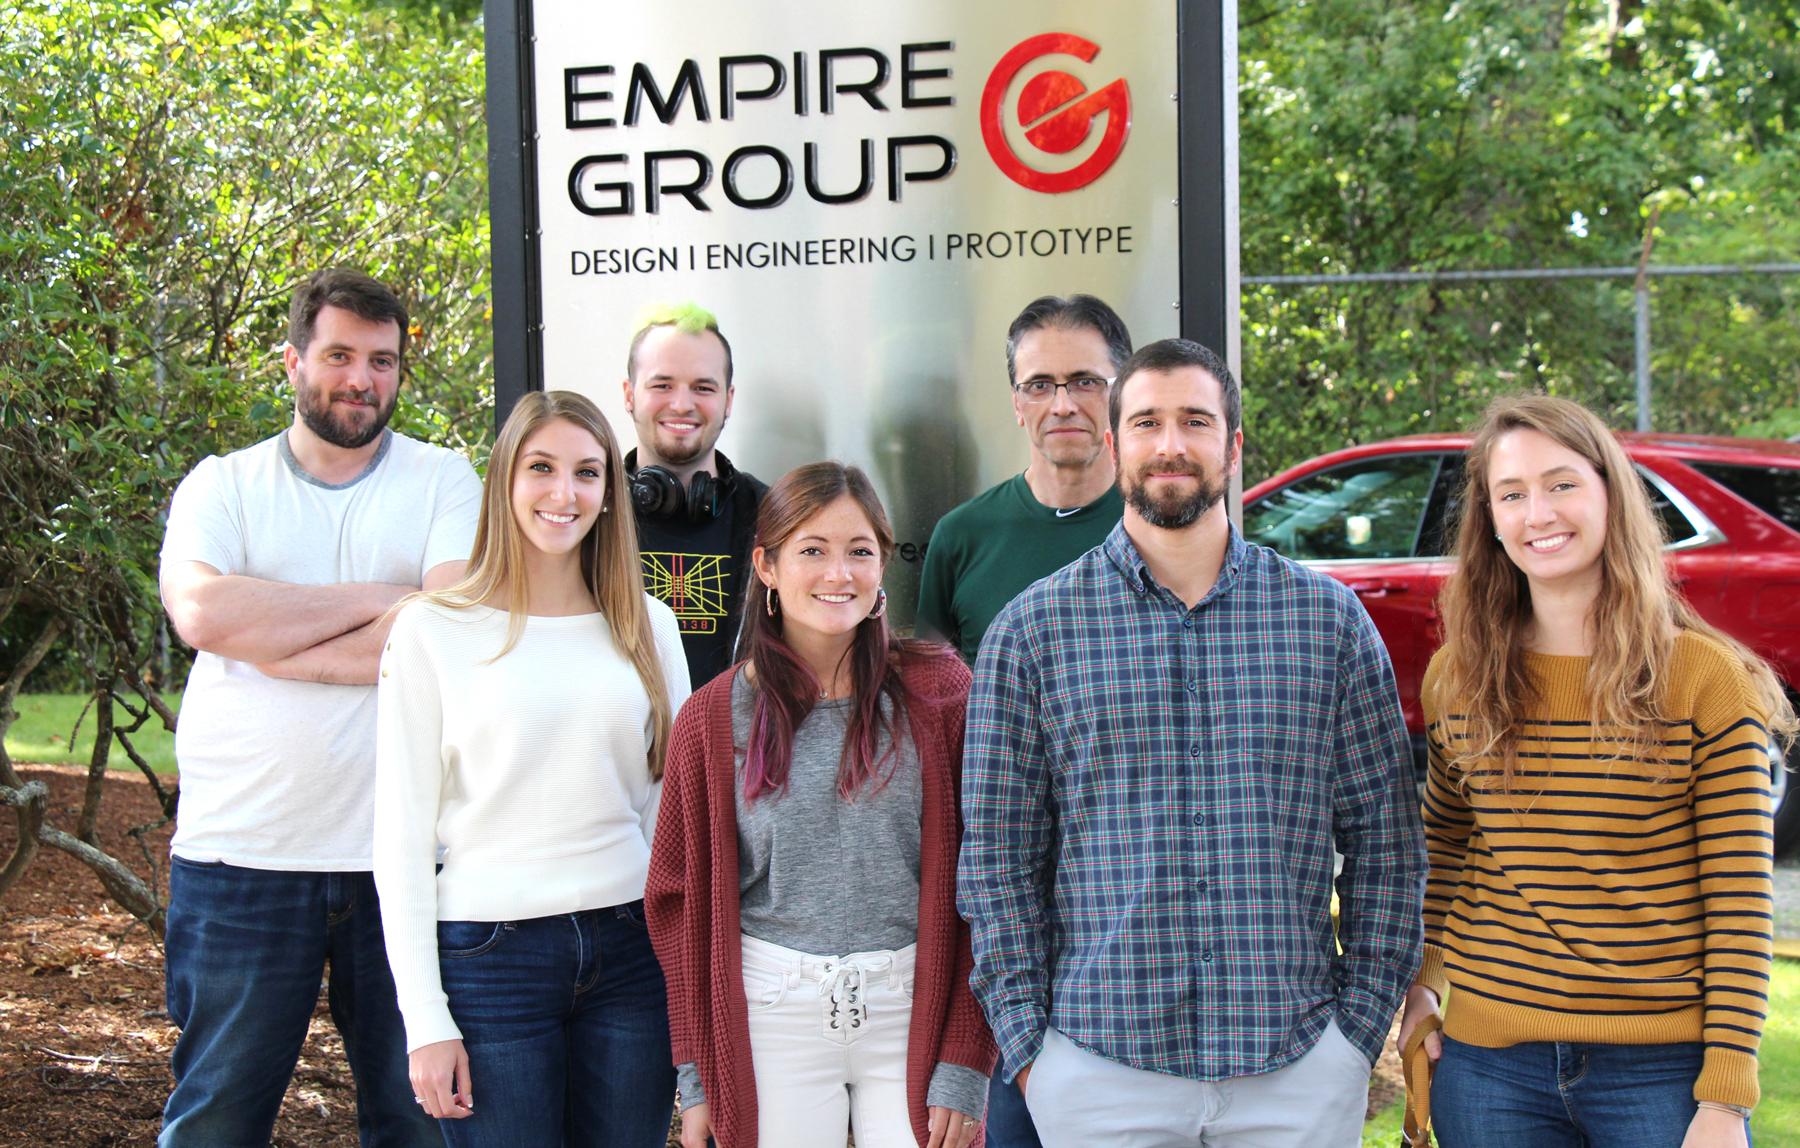 The Empire Group Design & Engineering Team - September 2019